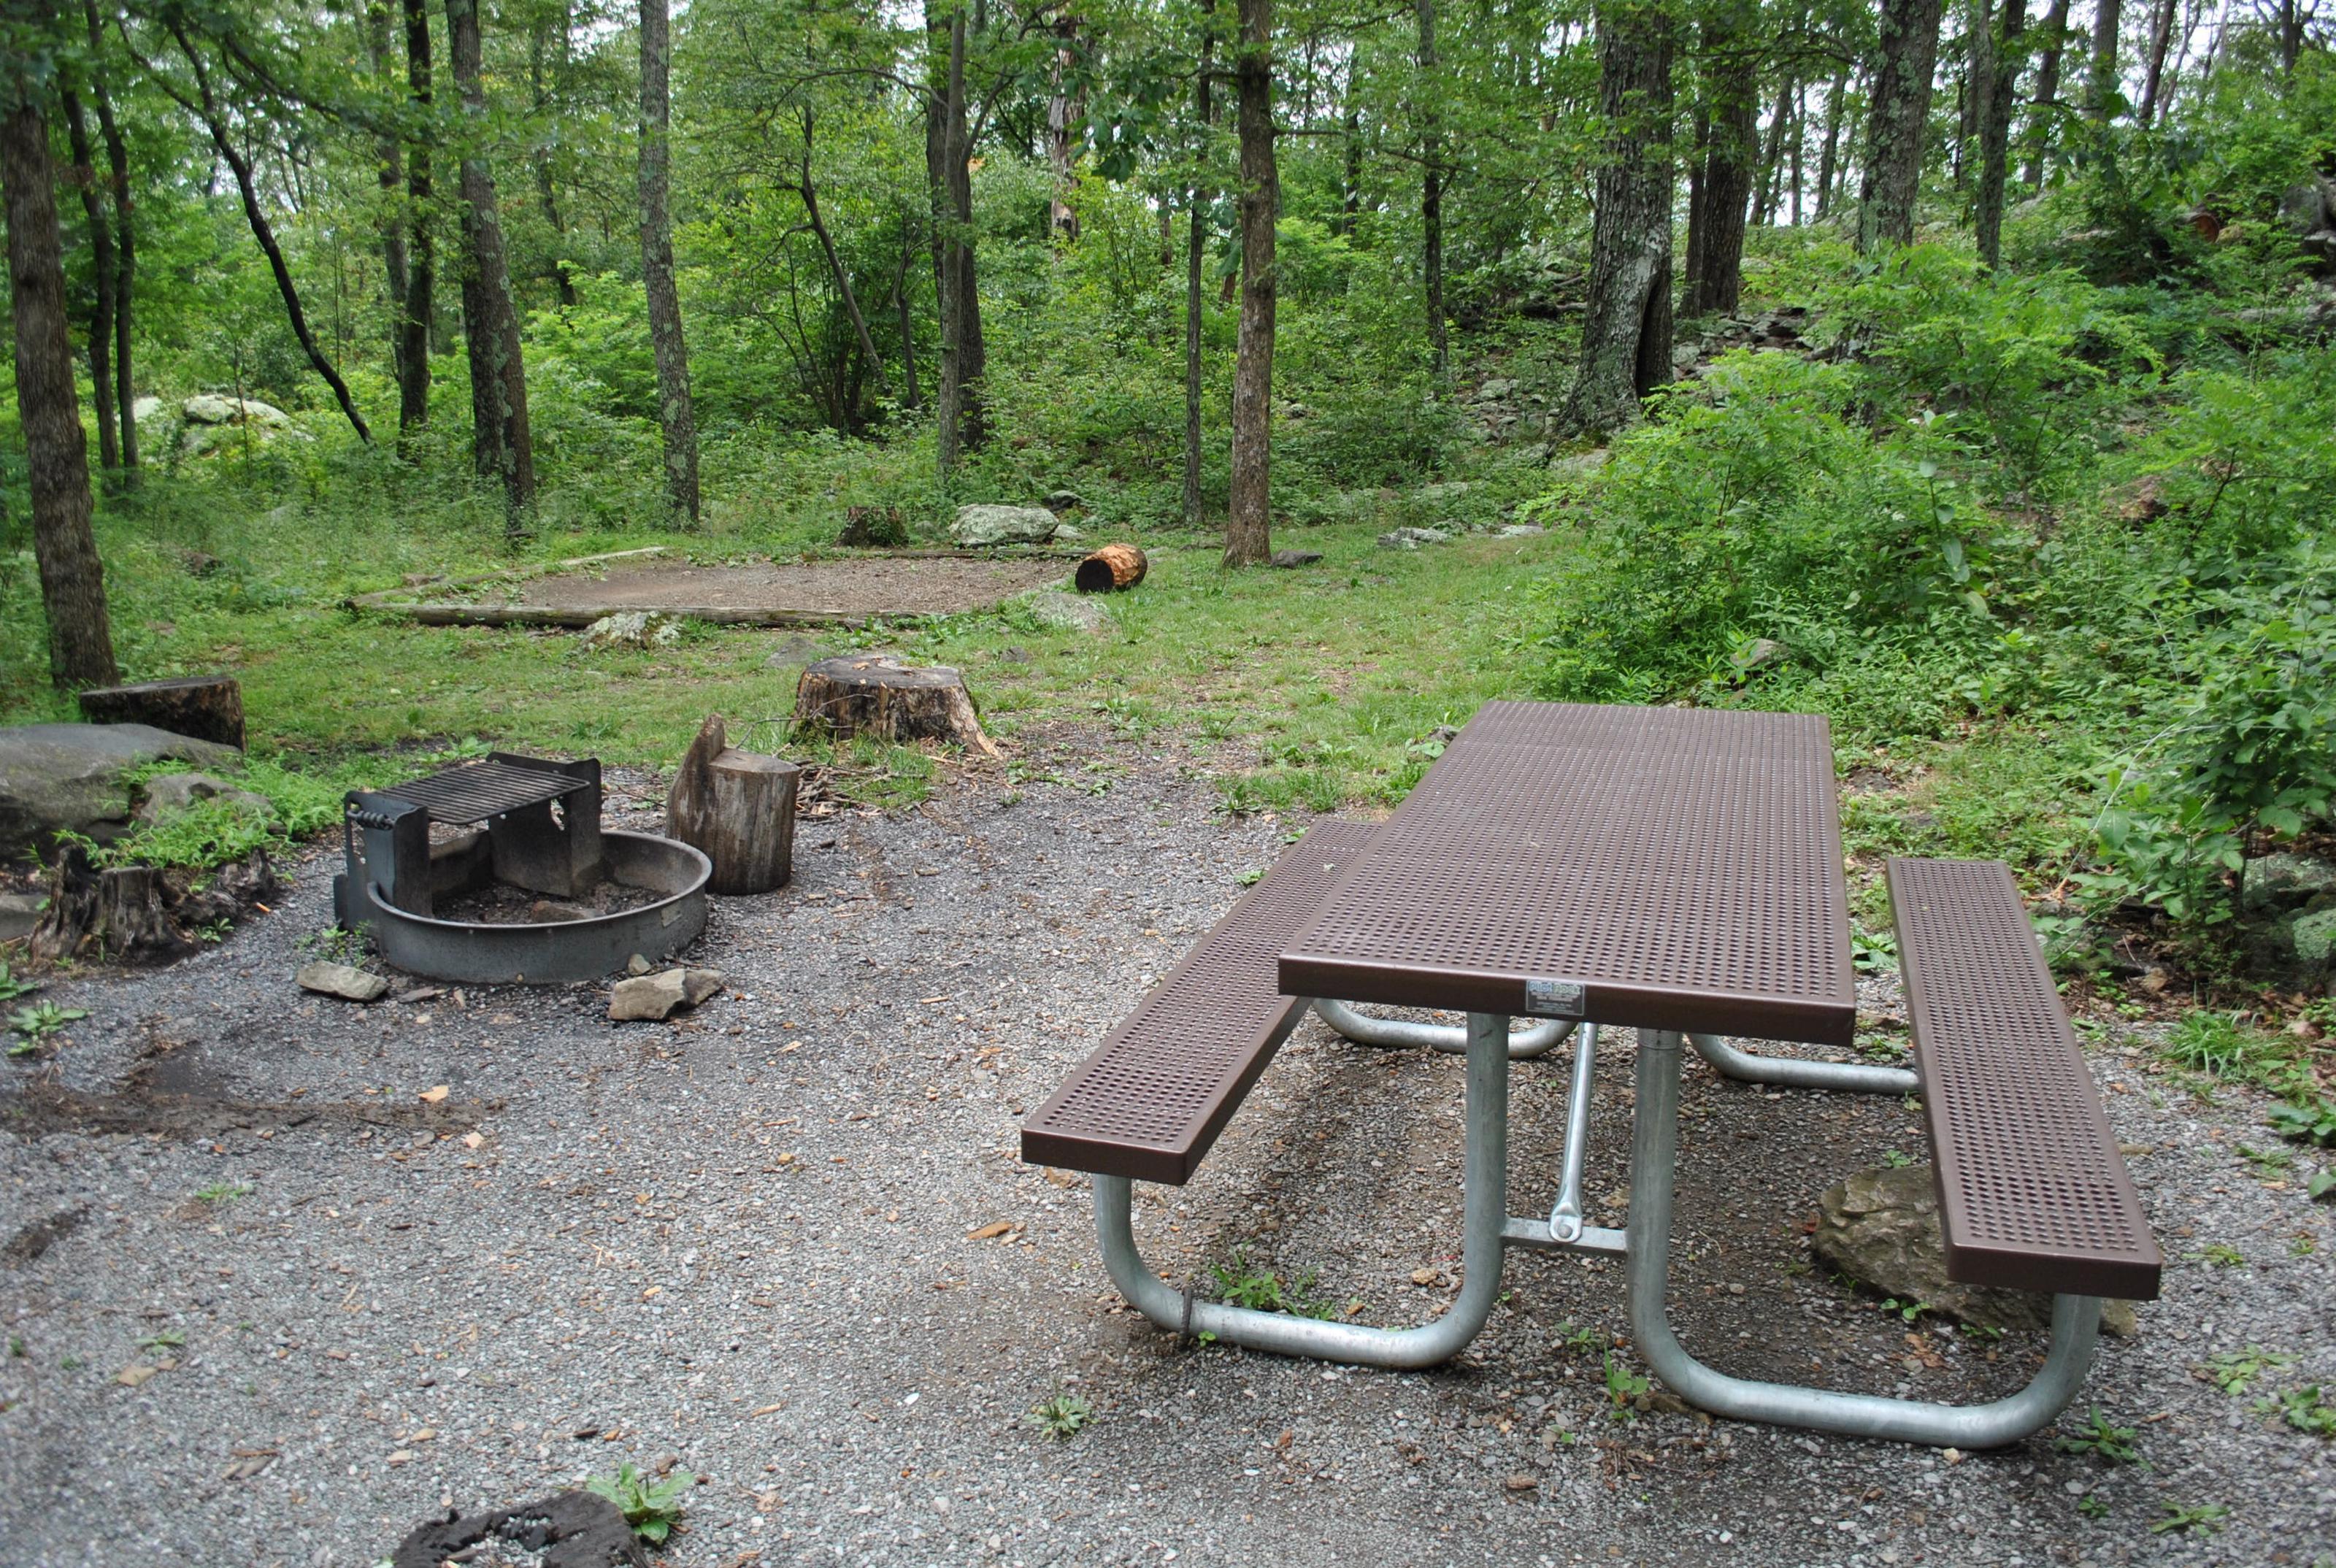 Mathews Arm Campground – Site A068